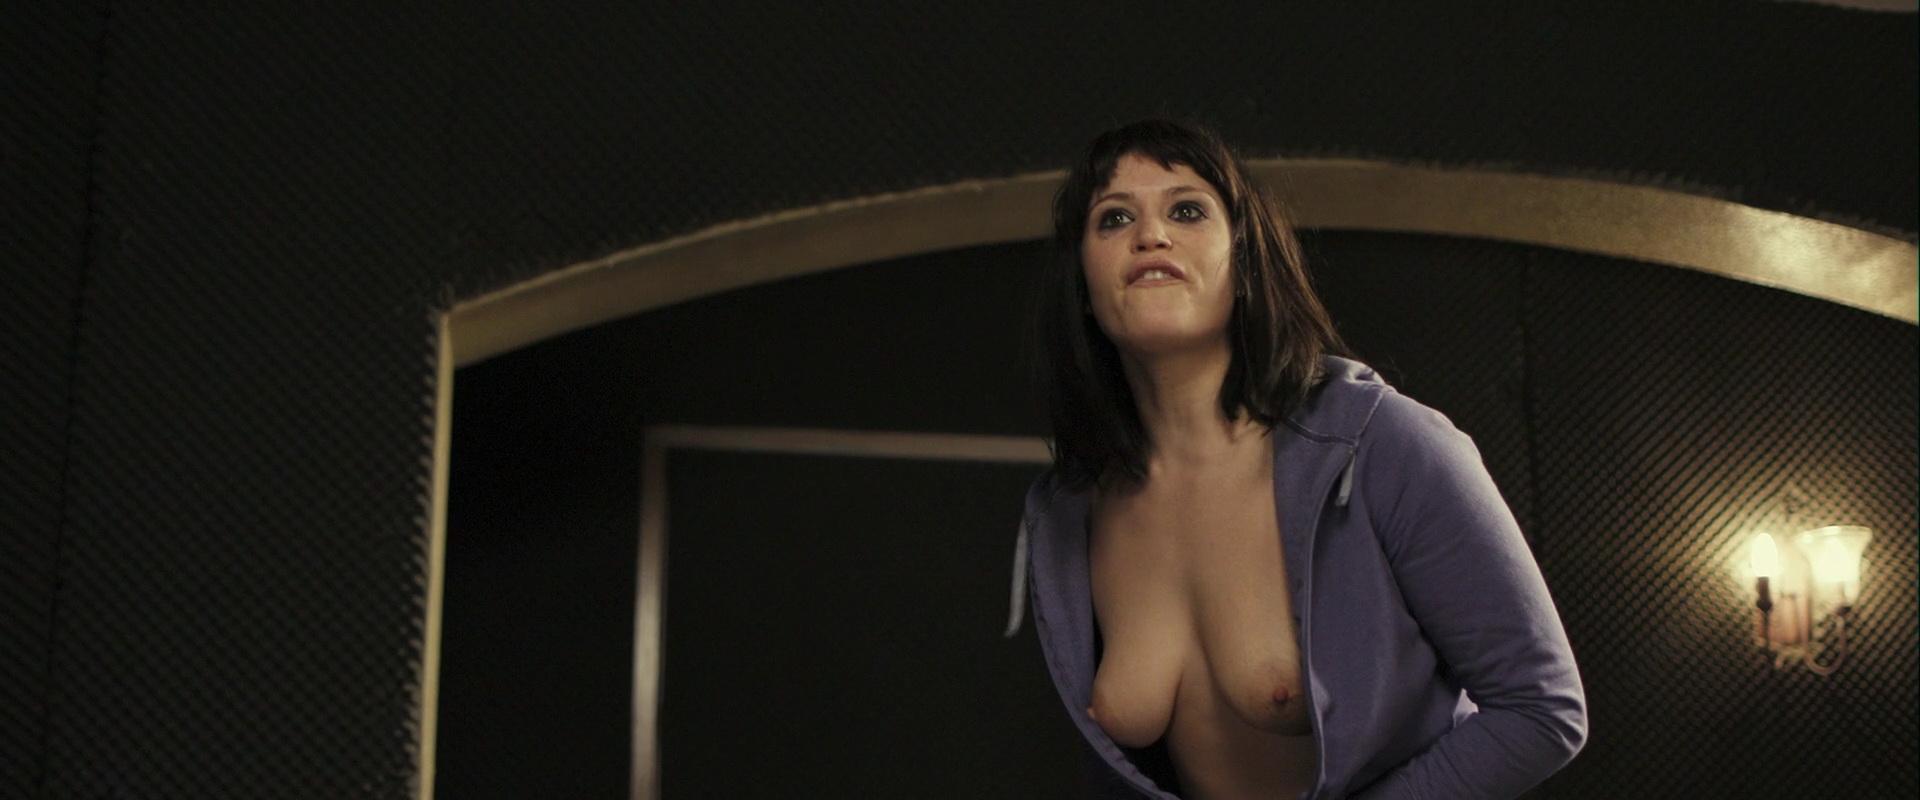 gemma arterton porn movie